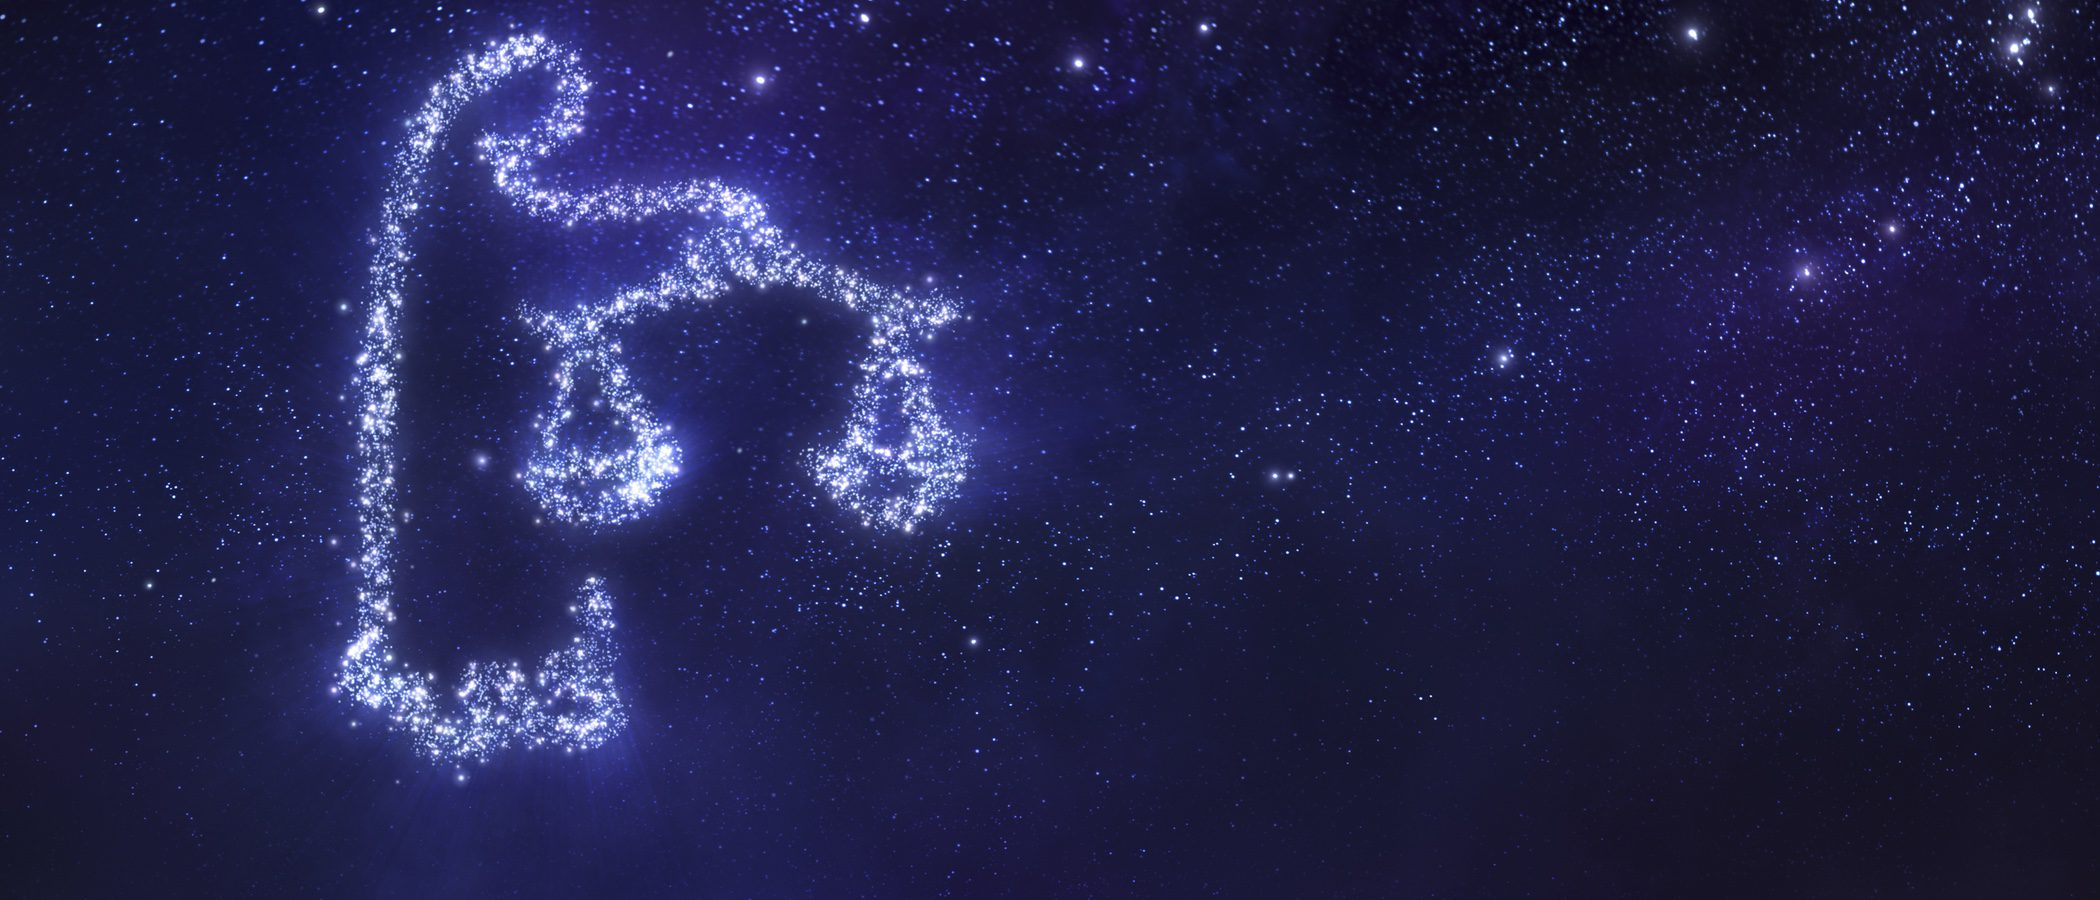 Horóscopo julio 2016: Libra